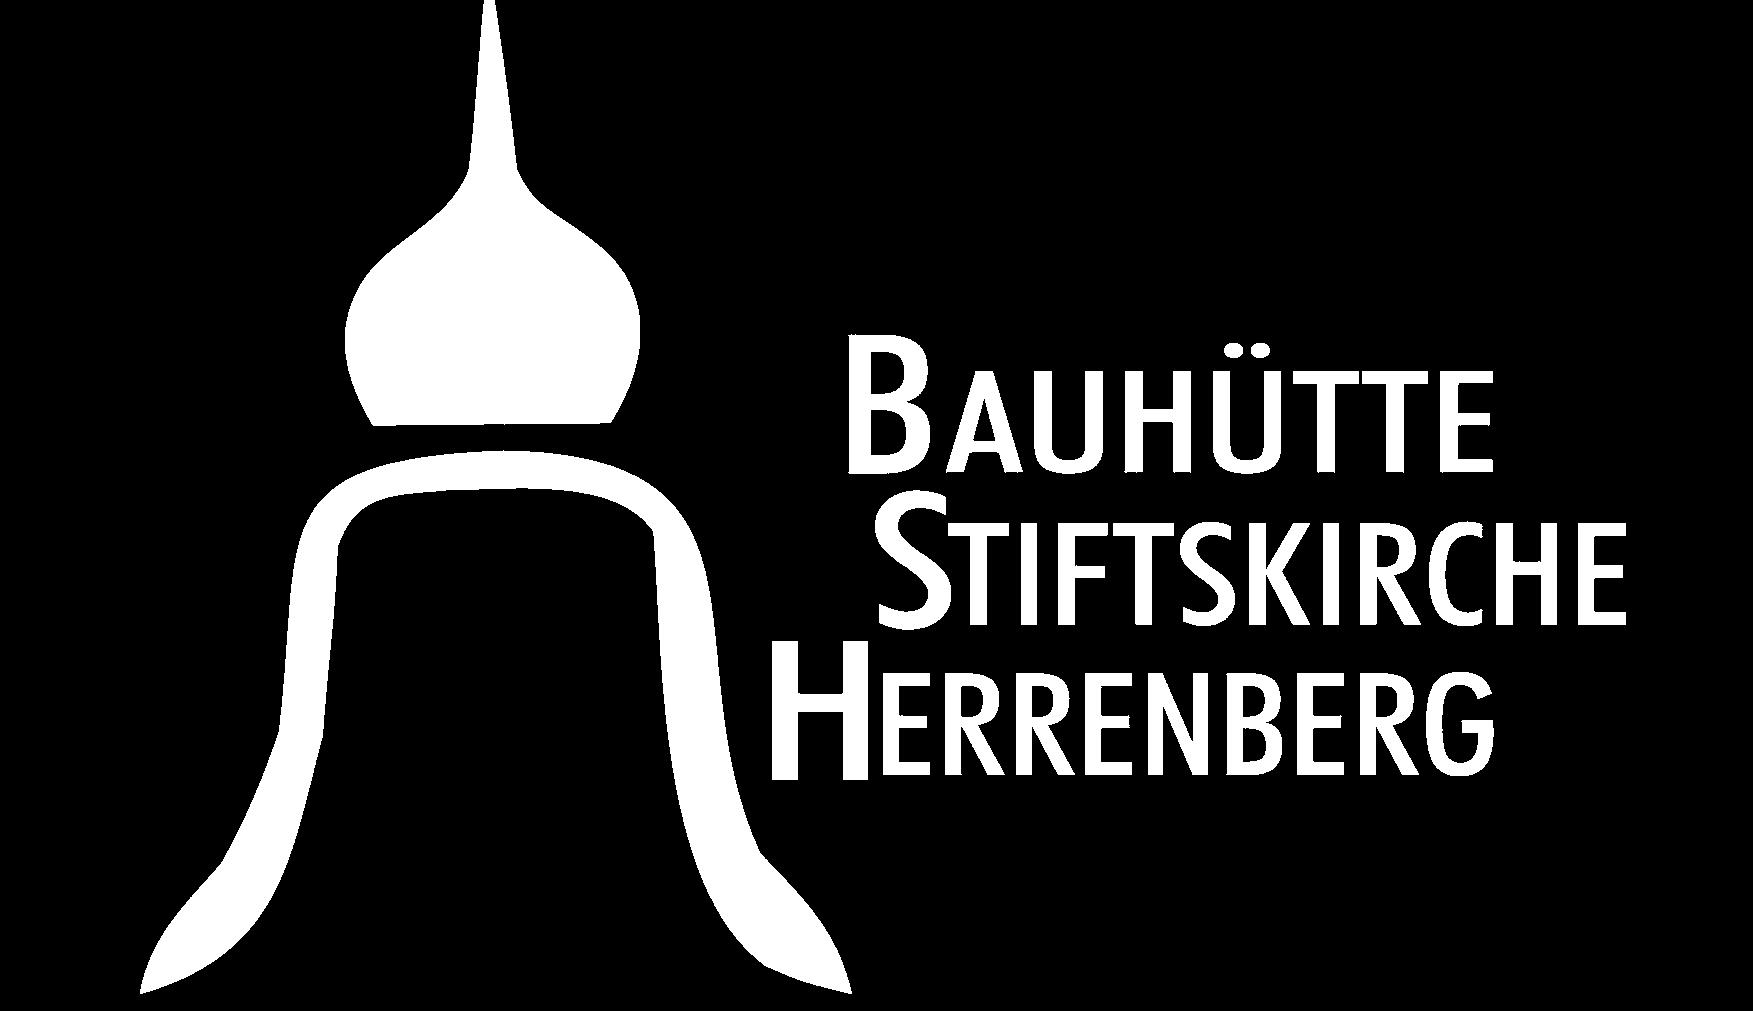 Bauhütte Herrenberg